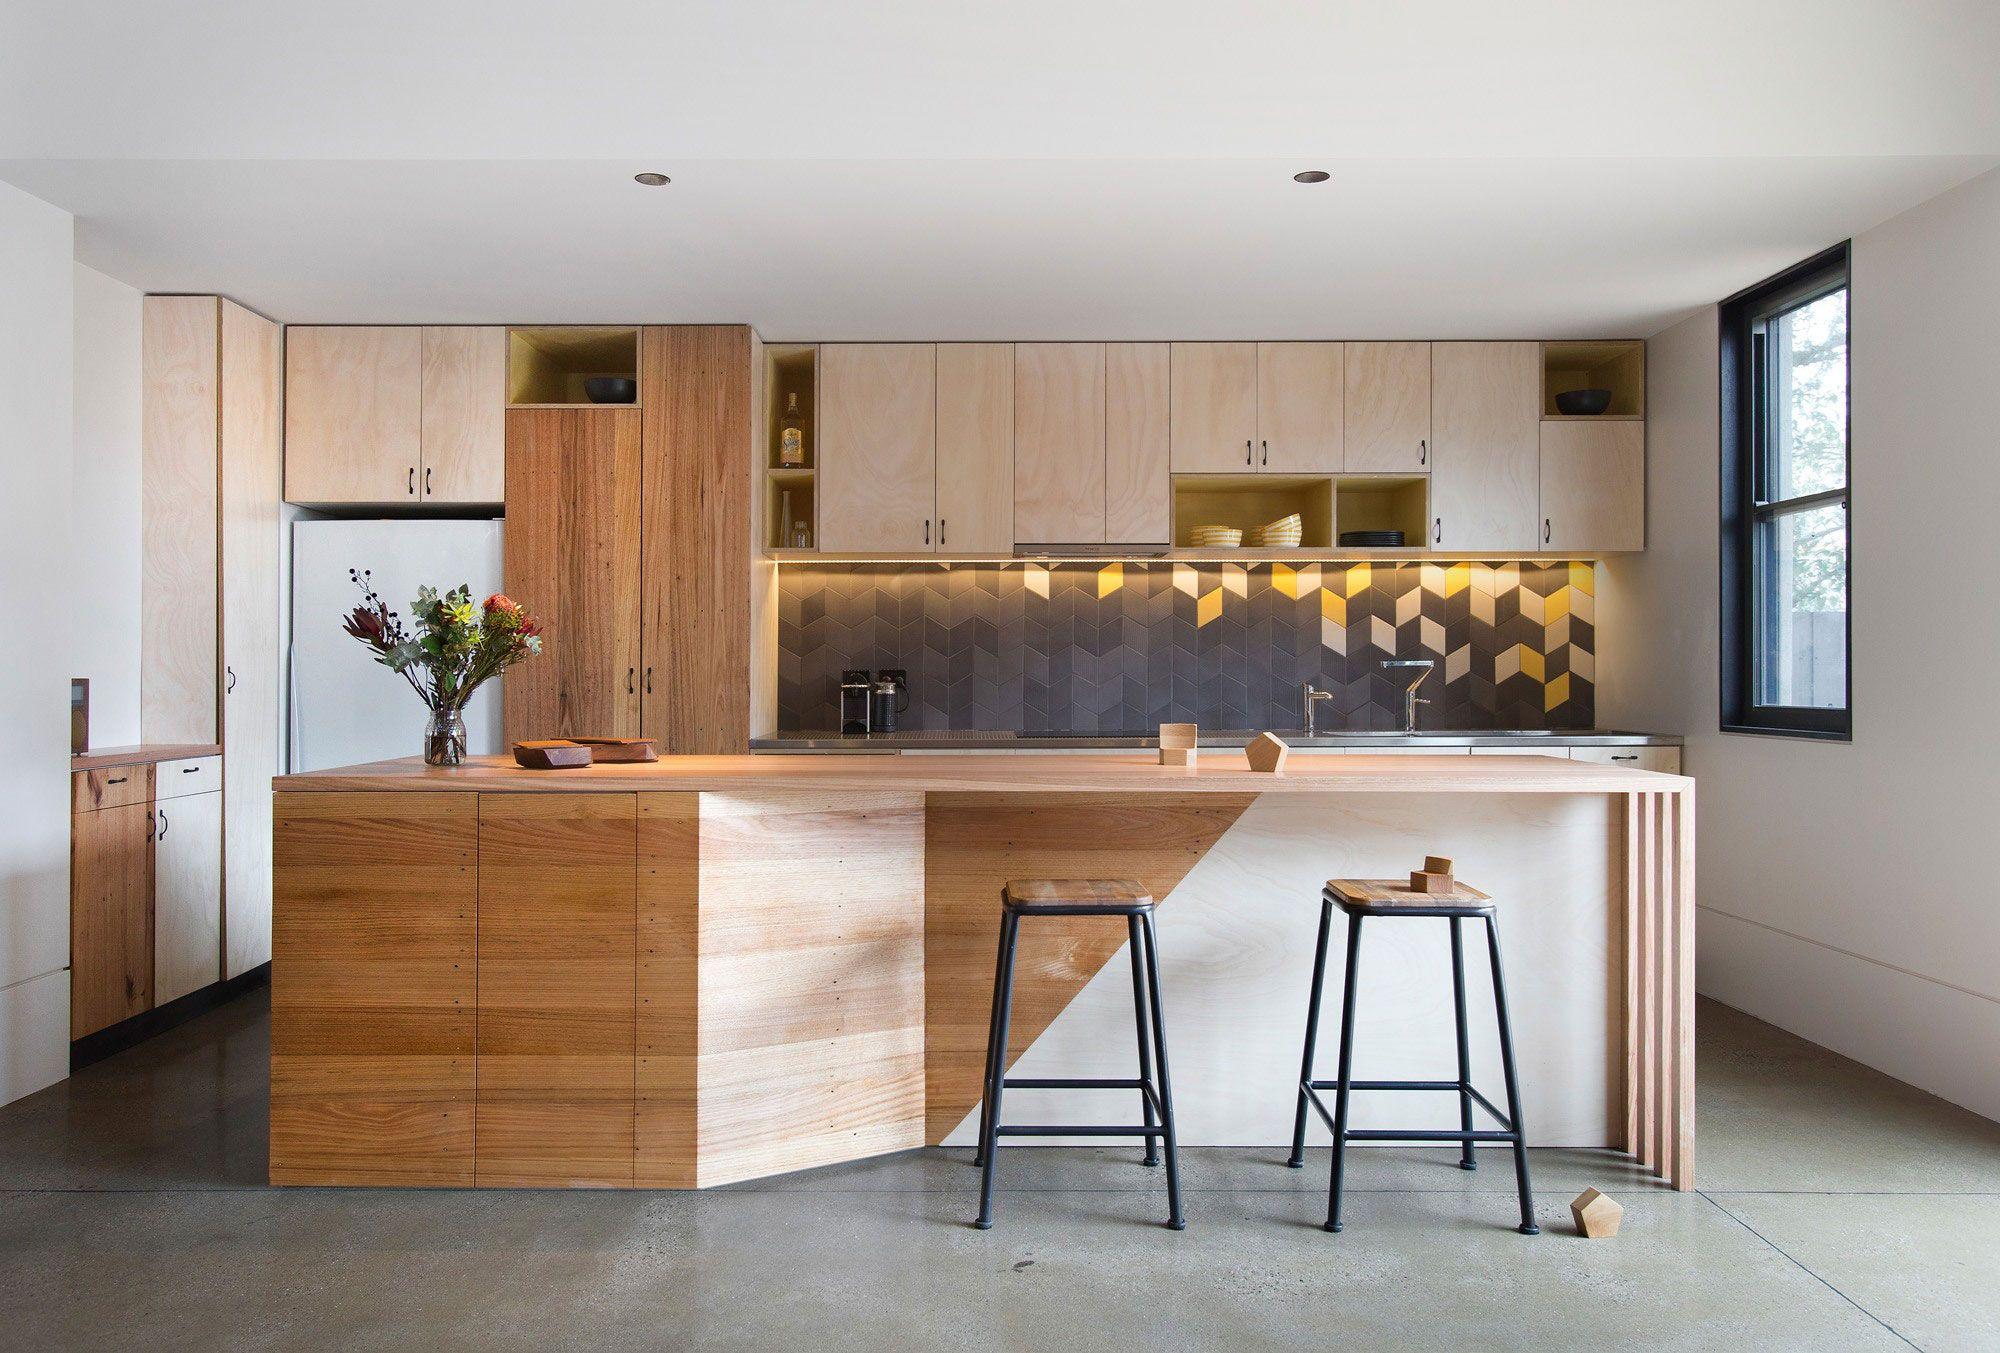 Pinterest  The World's Catalog Of Ideas Impressive Interior Design Kitchens 2014 Design Inspiration